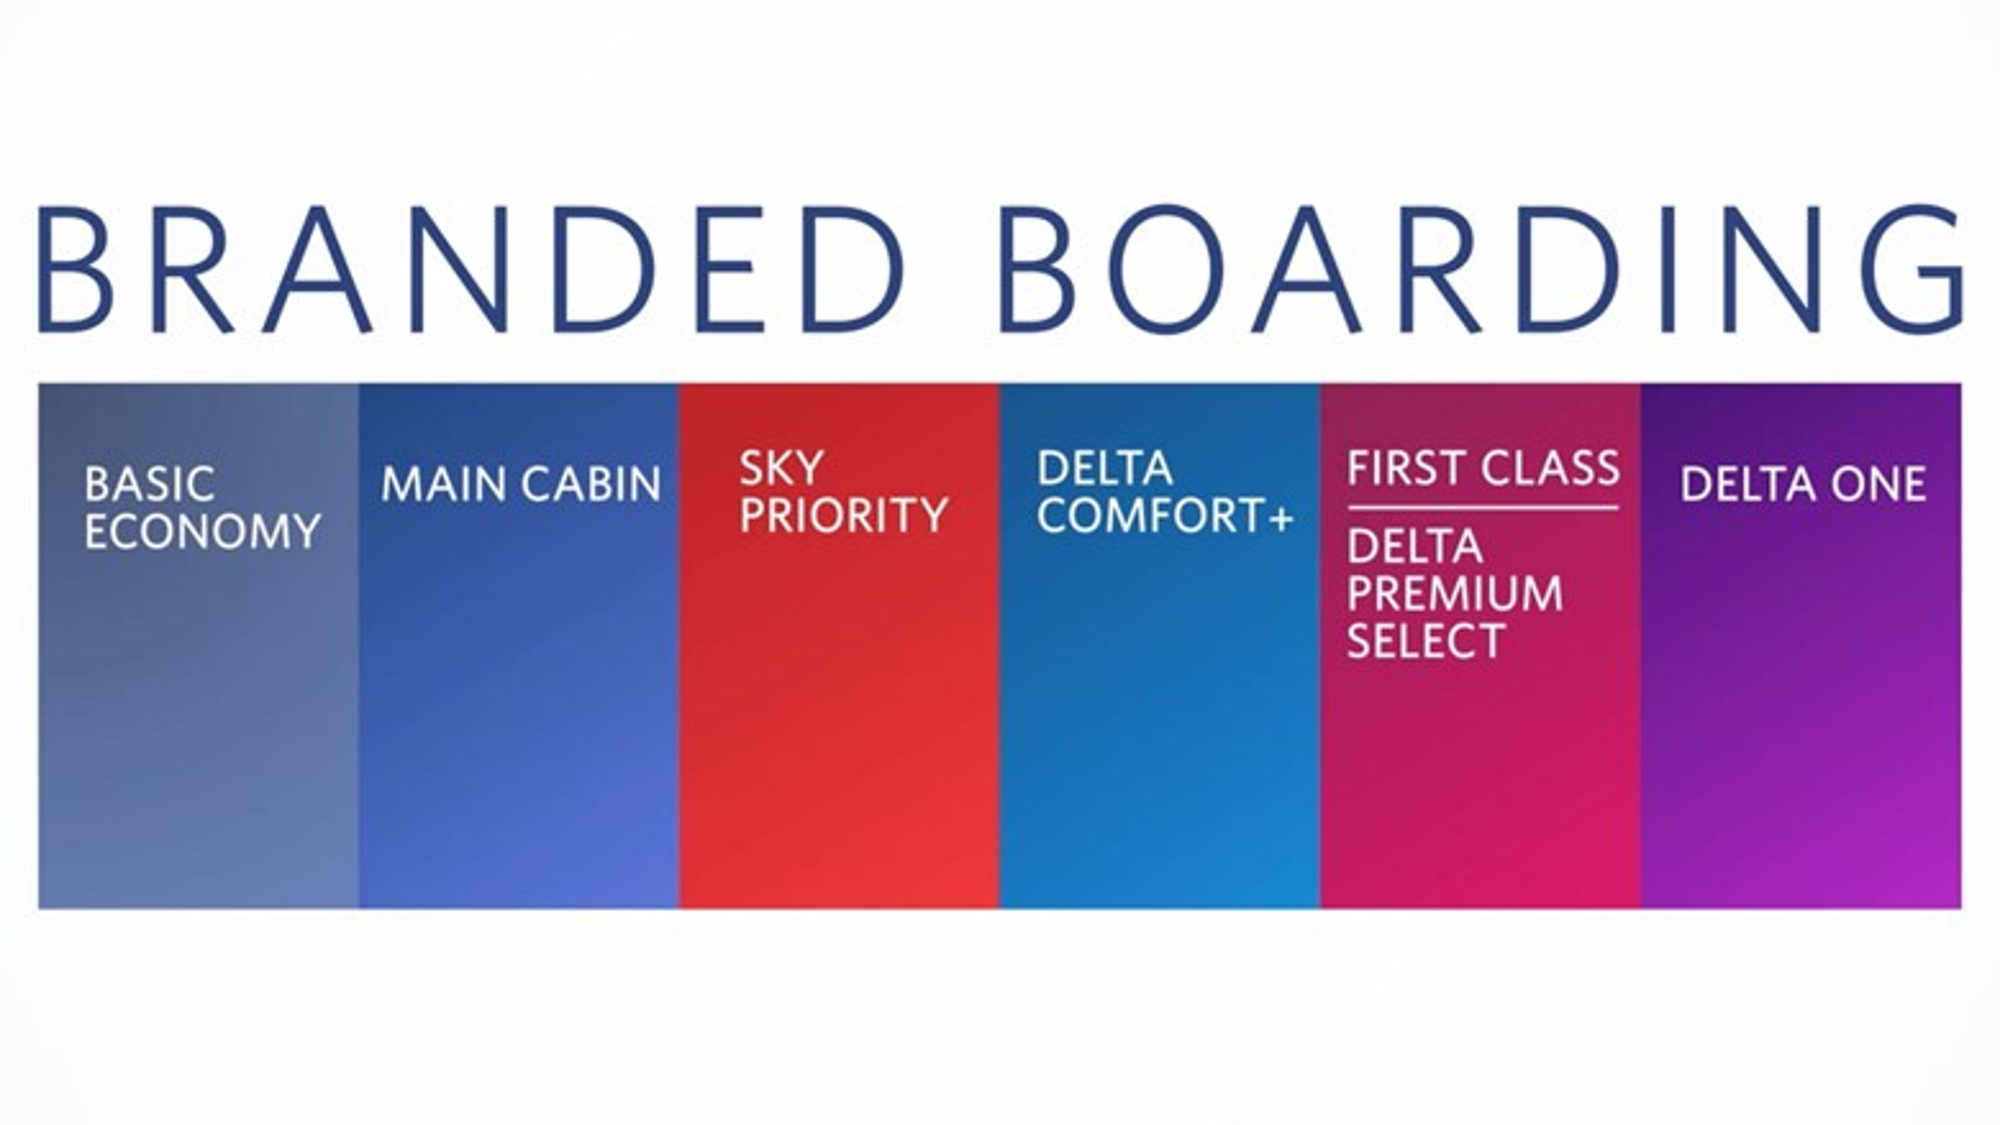 Delta tweaking boarding procedure: Travel Weekly